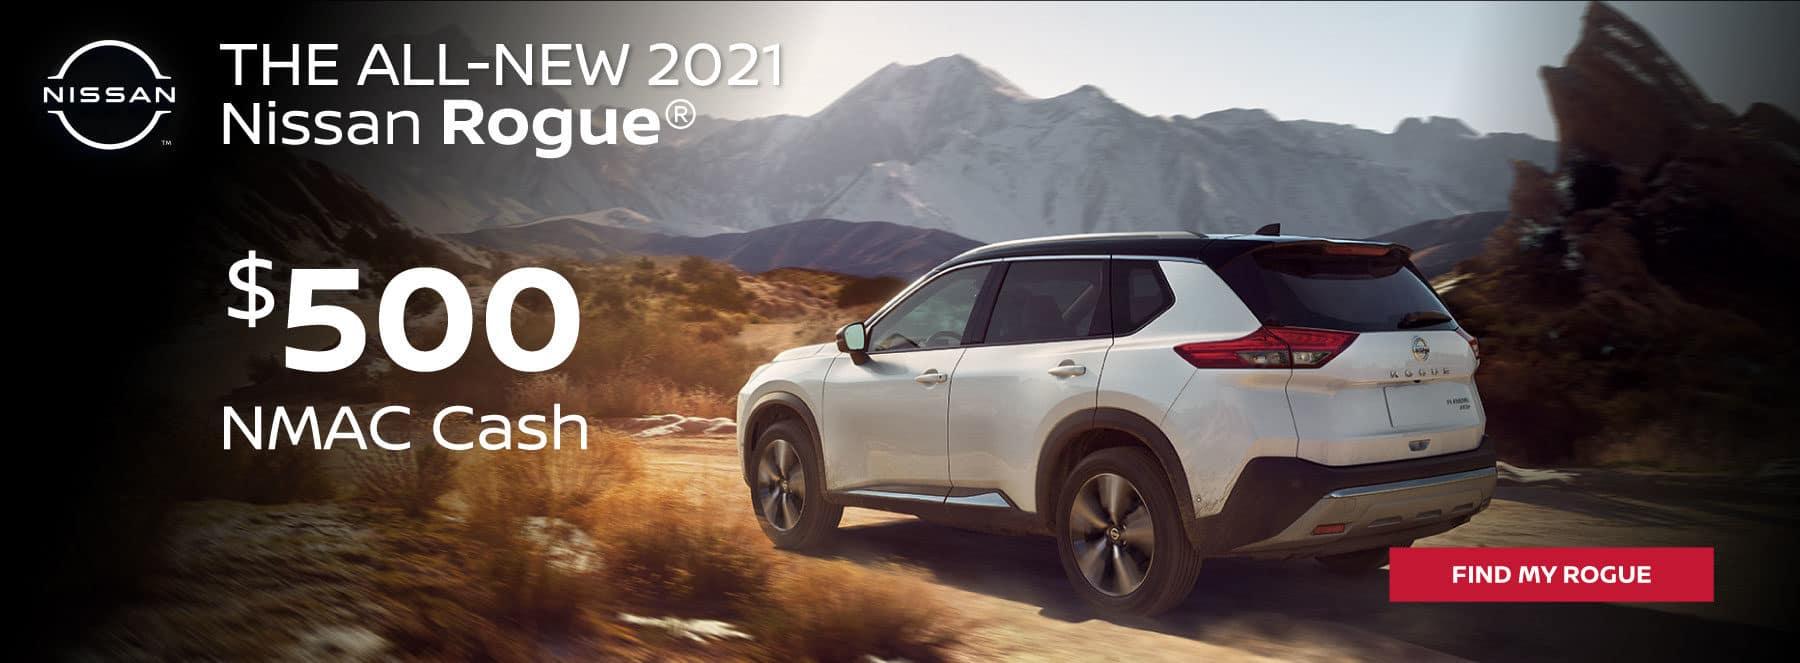 2021 Nissan Rogue $500 NMAC Cash